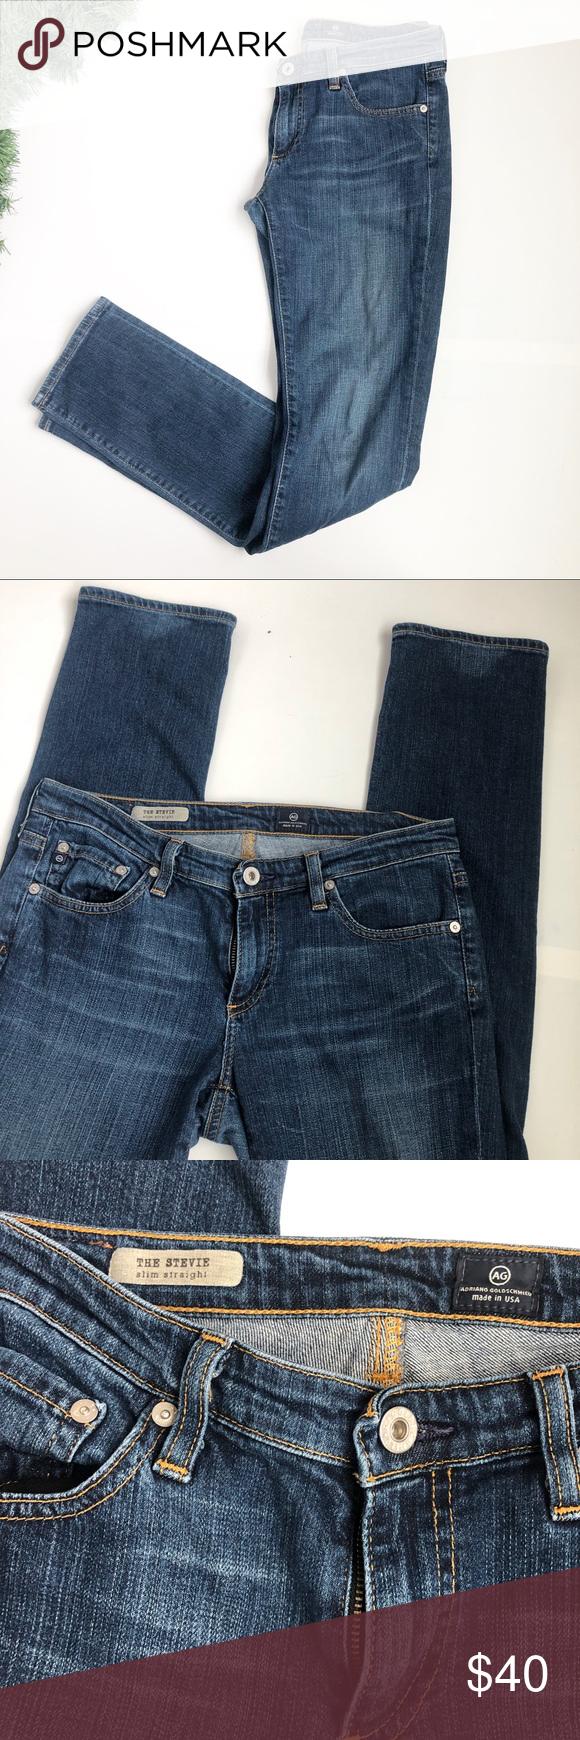 "420c9756abe Adriano Goldschmied AG ""The Stevie""   28R Adriano Goldschmied AG The Stevie  Slim Straight Jeans Size: 28R Waist: 14' Thigh width: 7.5' Waist to zipper:  5' ..."